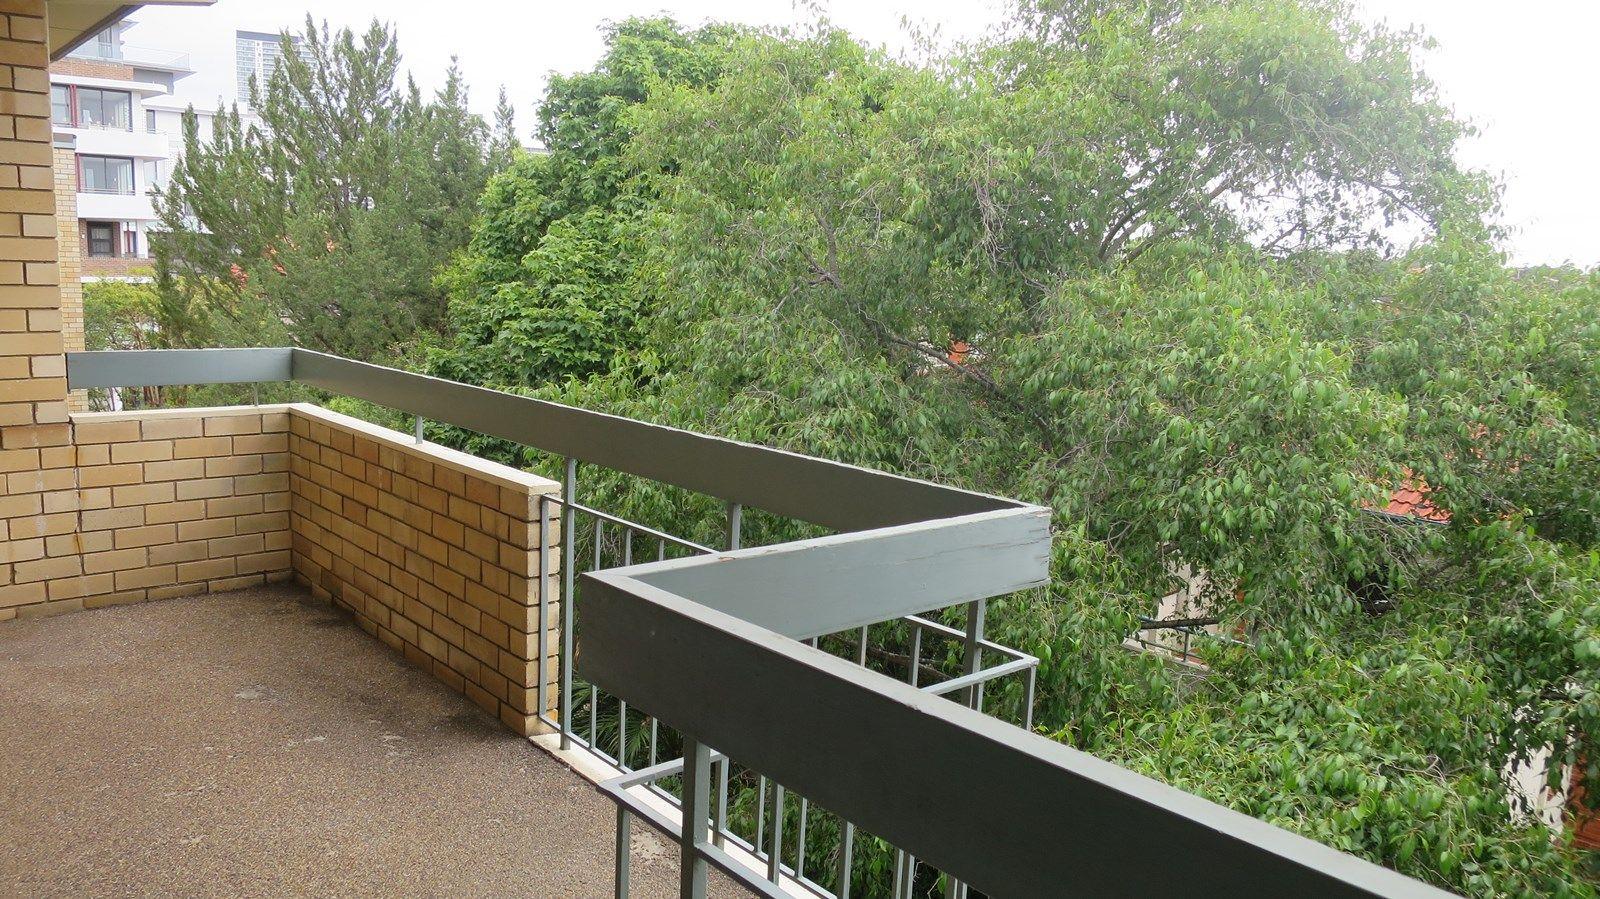 17/61-63 Hercules Street, Chatswood NSW 2067, Image 1